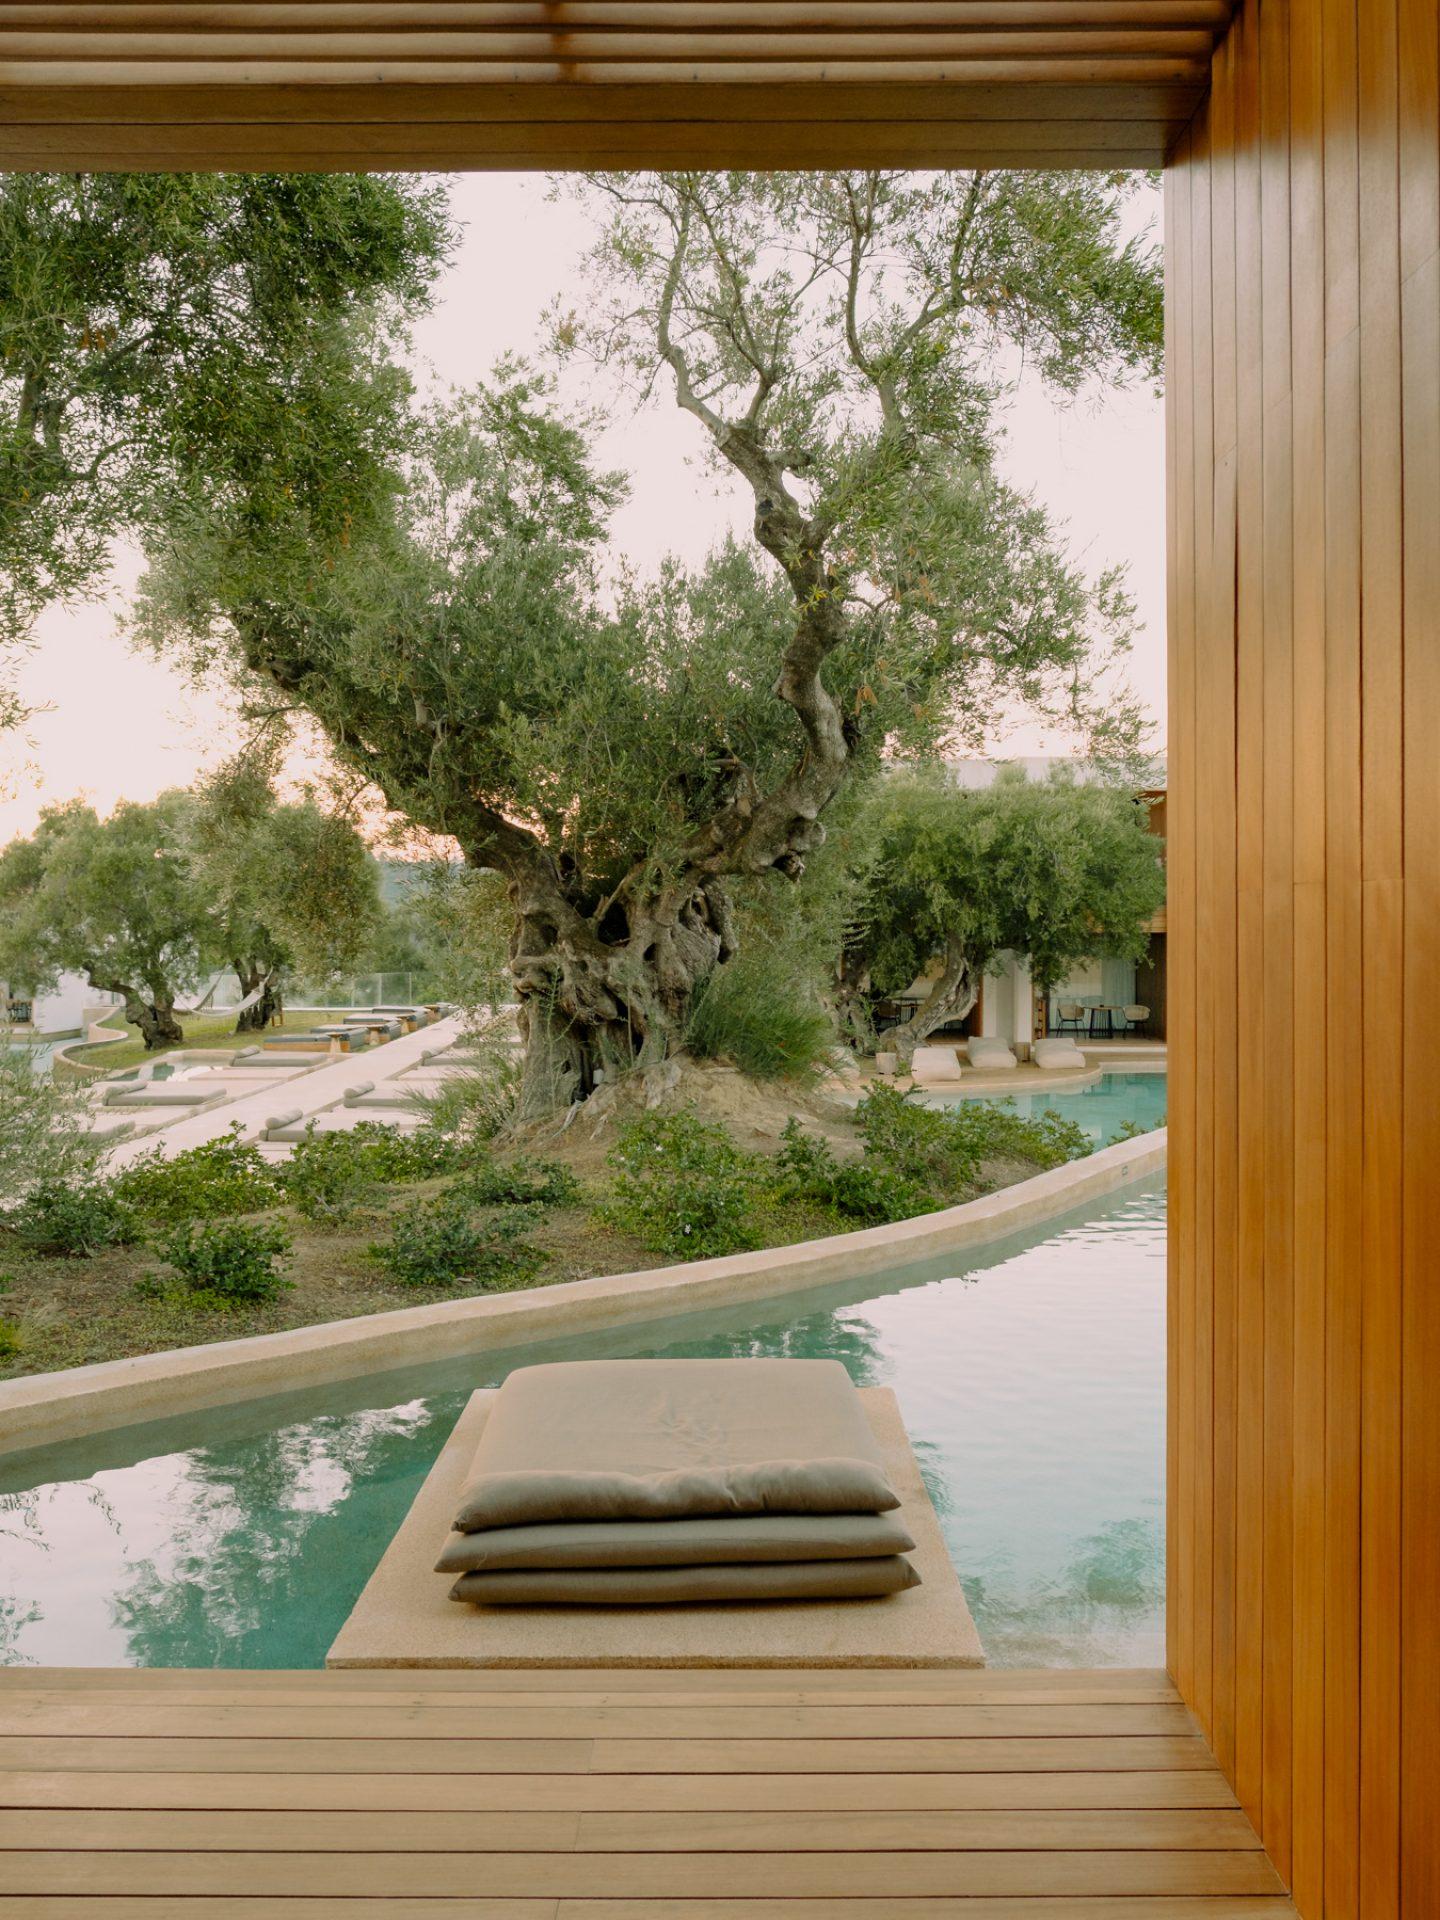 IGNANT-Travel-Olea-All-Suite-hotel-Greece-012